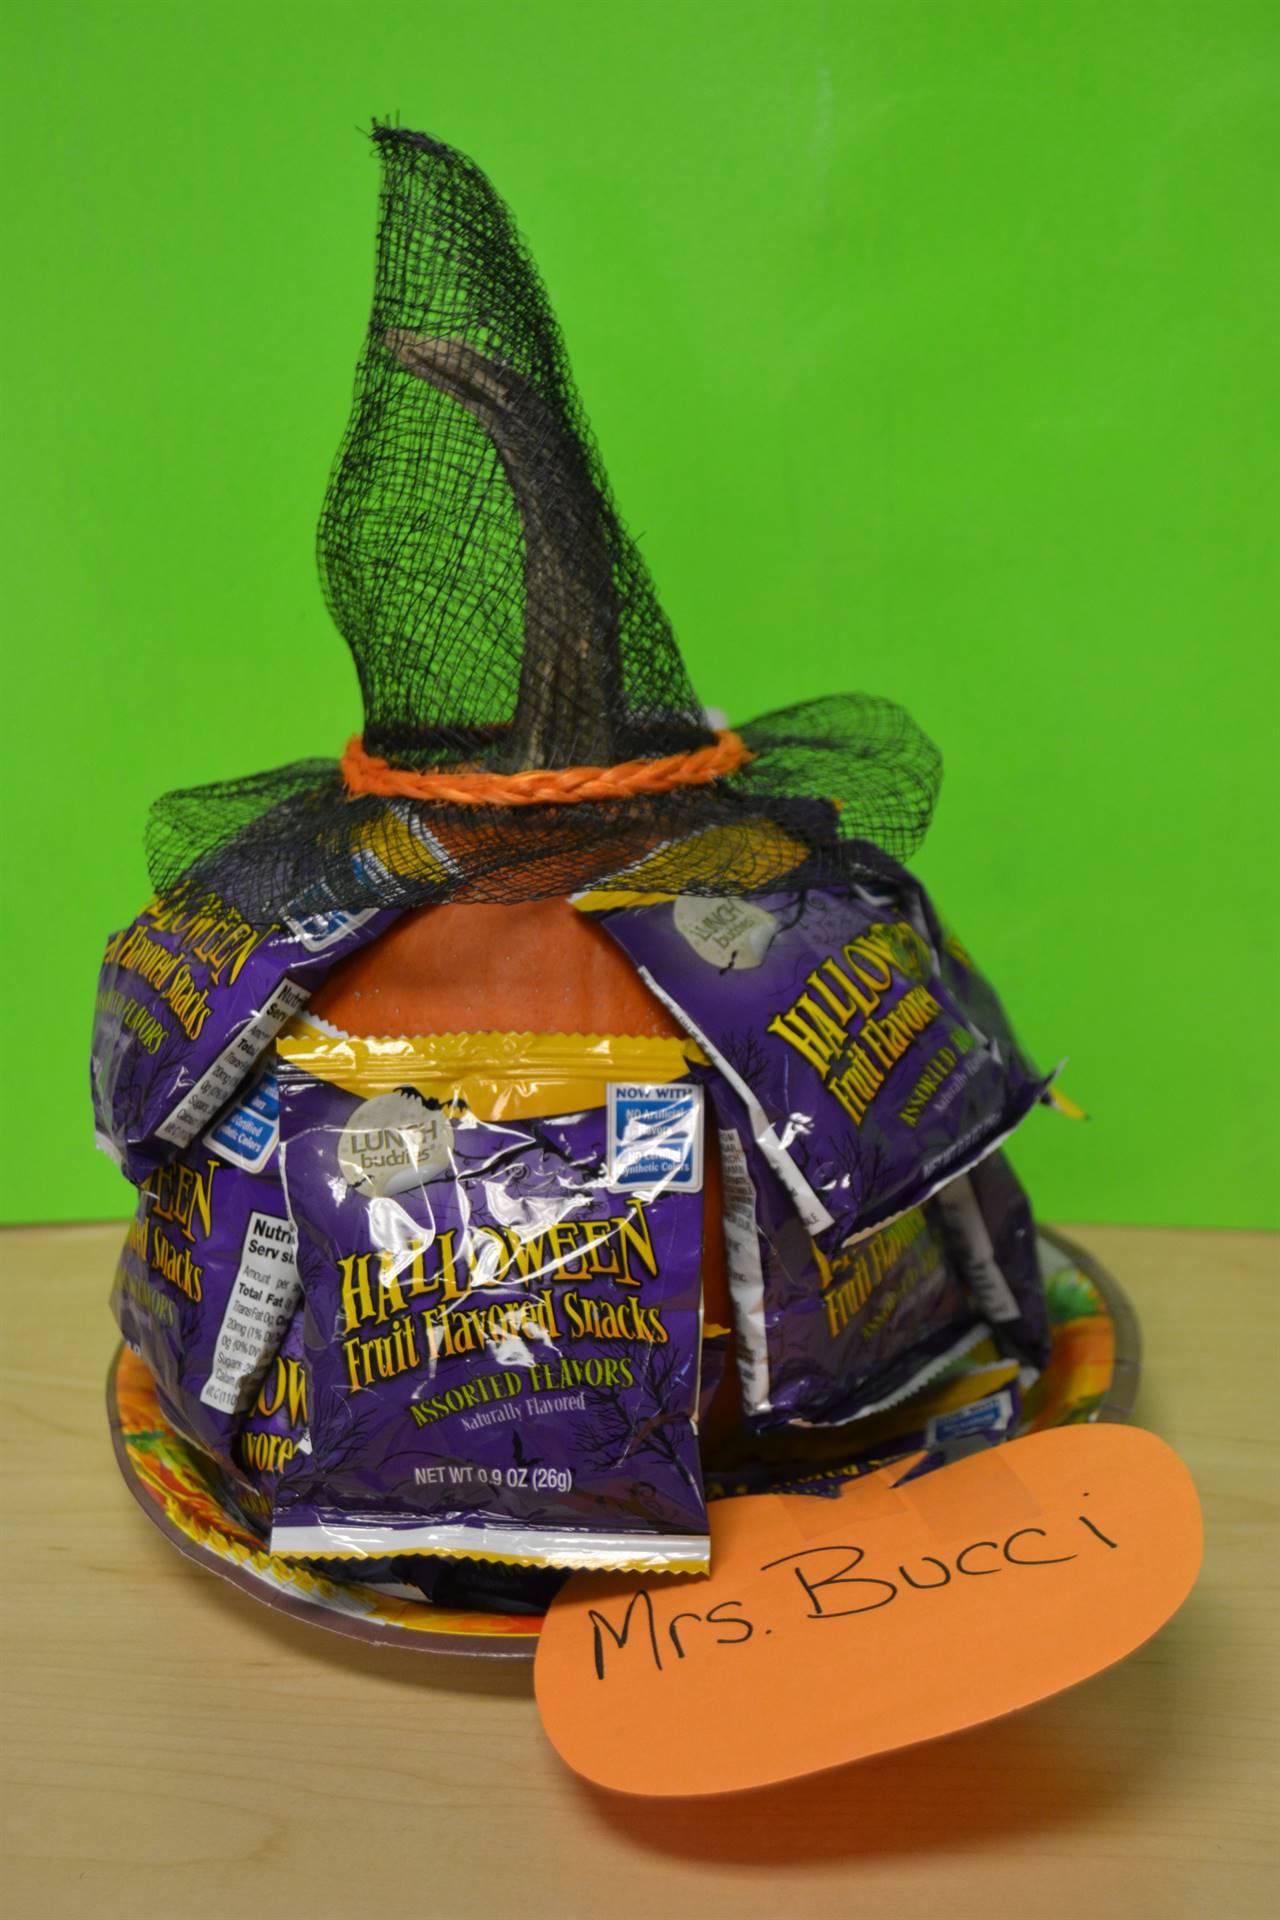 Pumpkin created by Mrs. Bucci